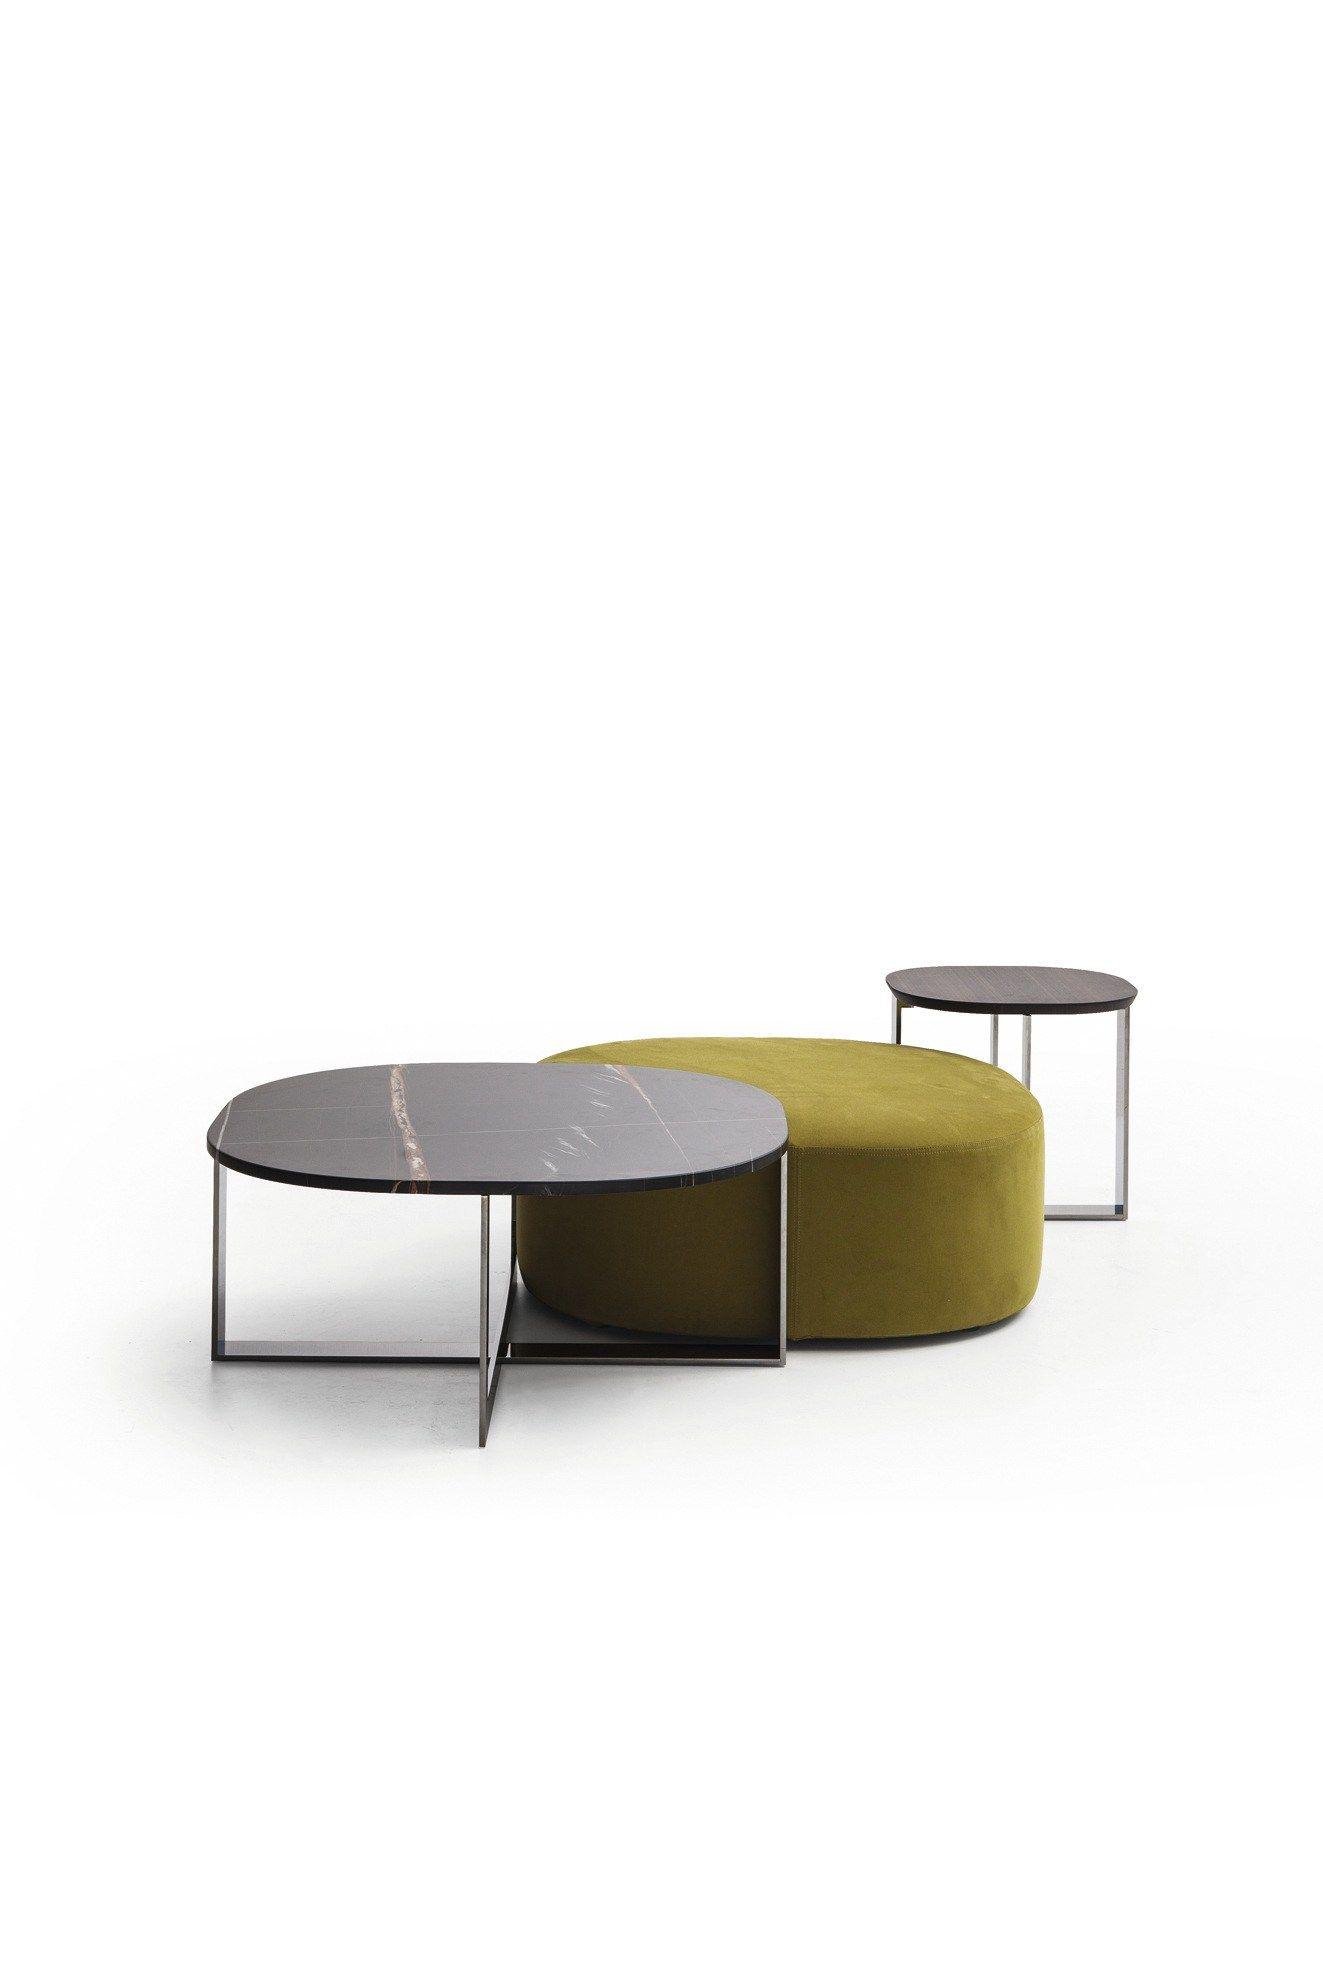 domino next molteni c coffee tables round domino next molteni geotapseo Image collections